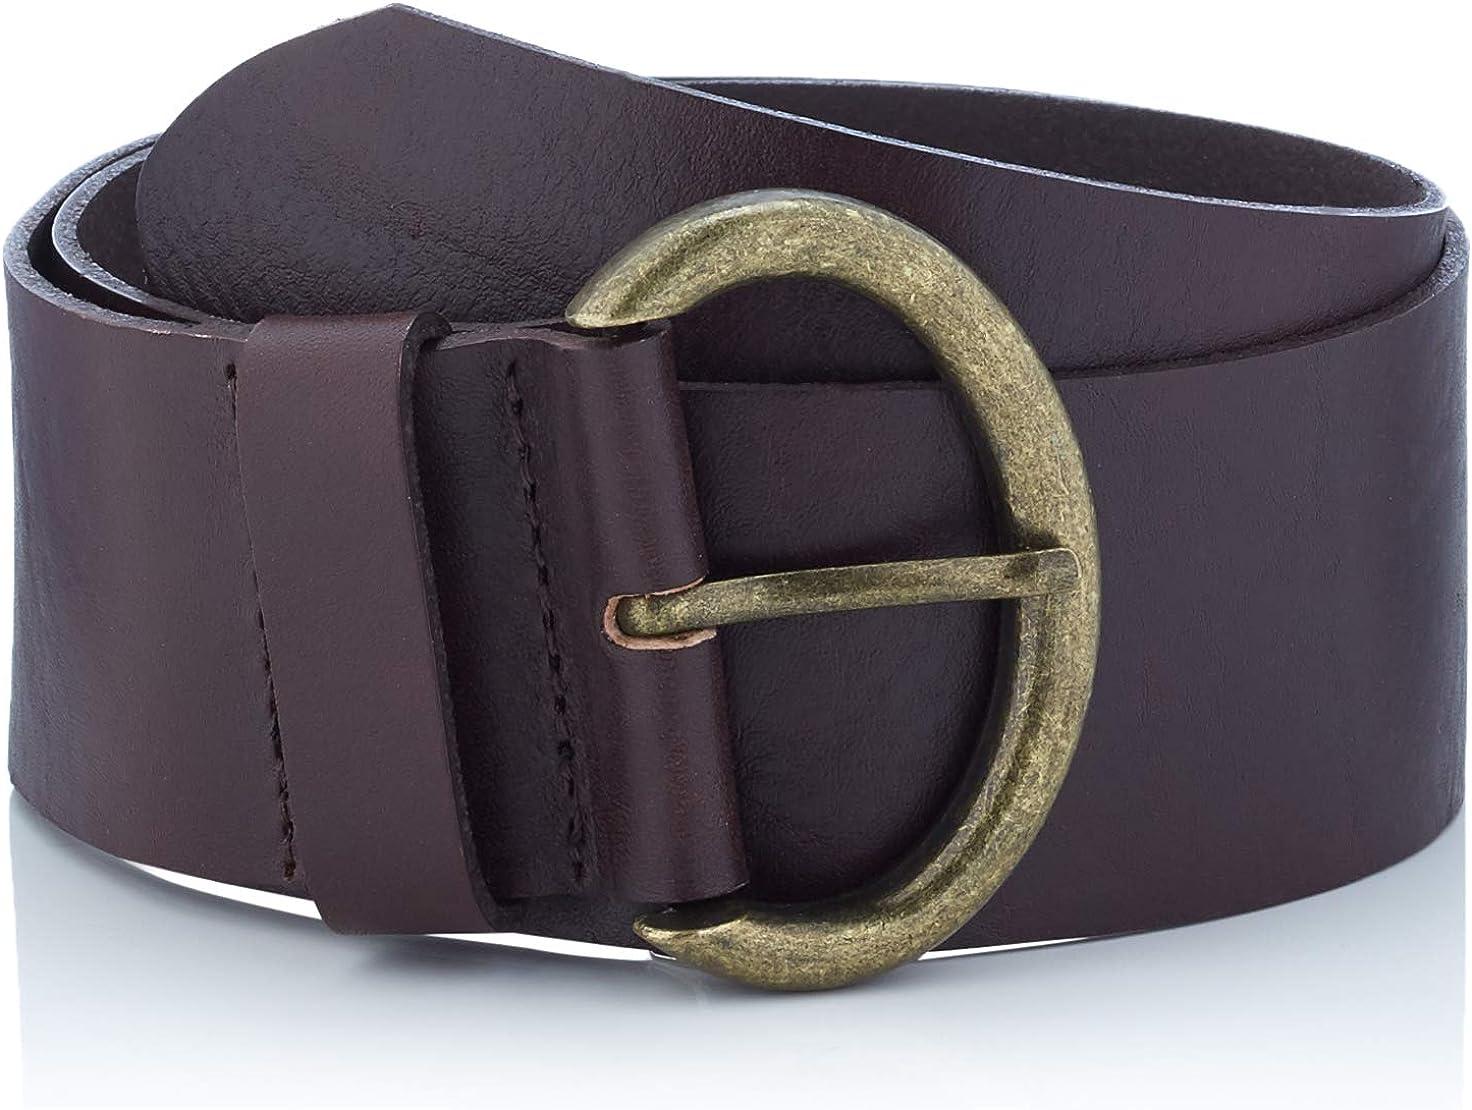 United Colors of Benetton Cintura Cintur/ón para Mujer